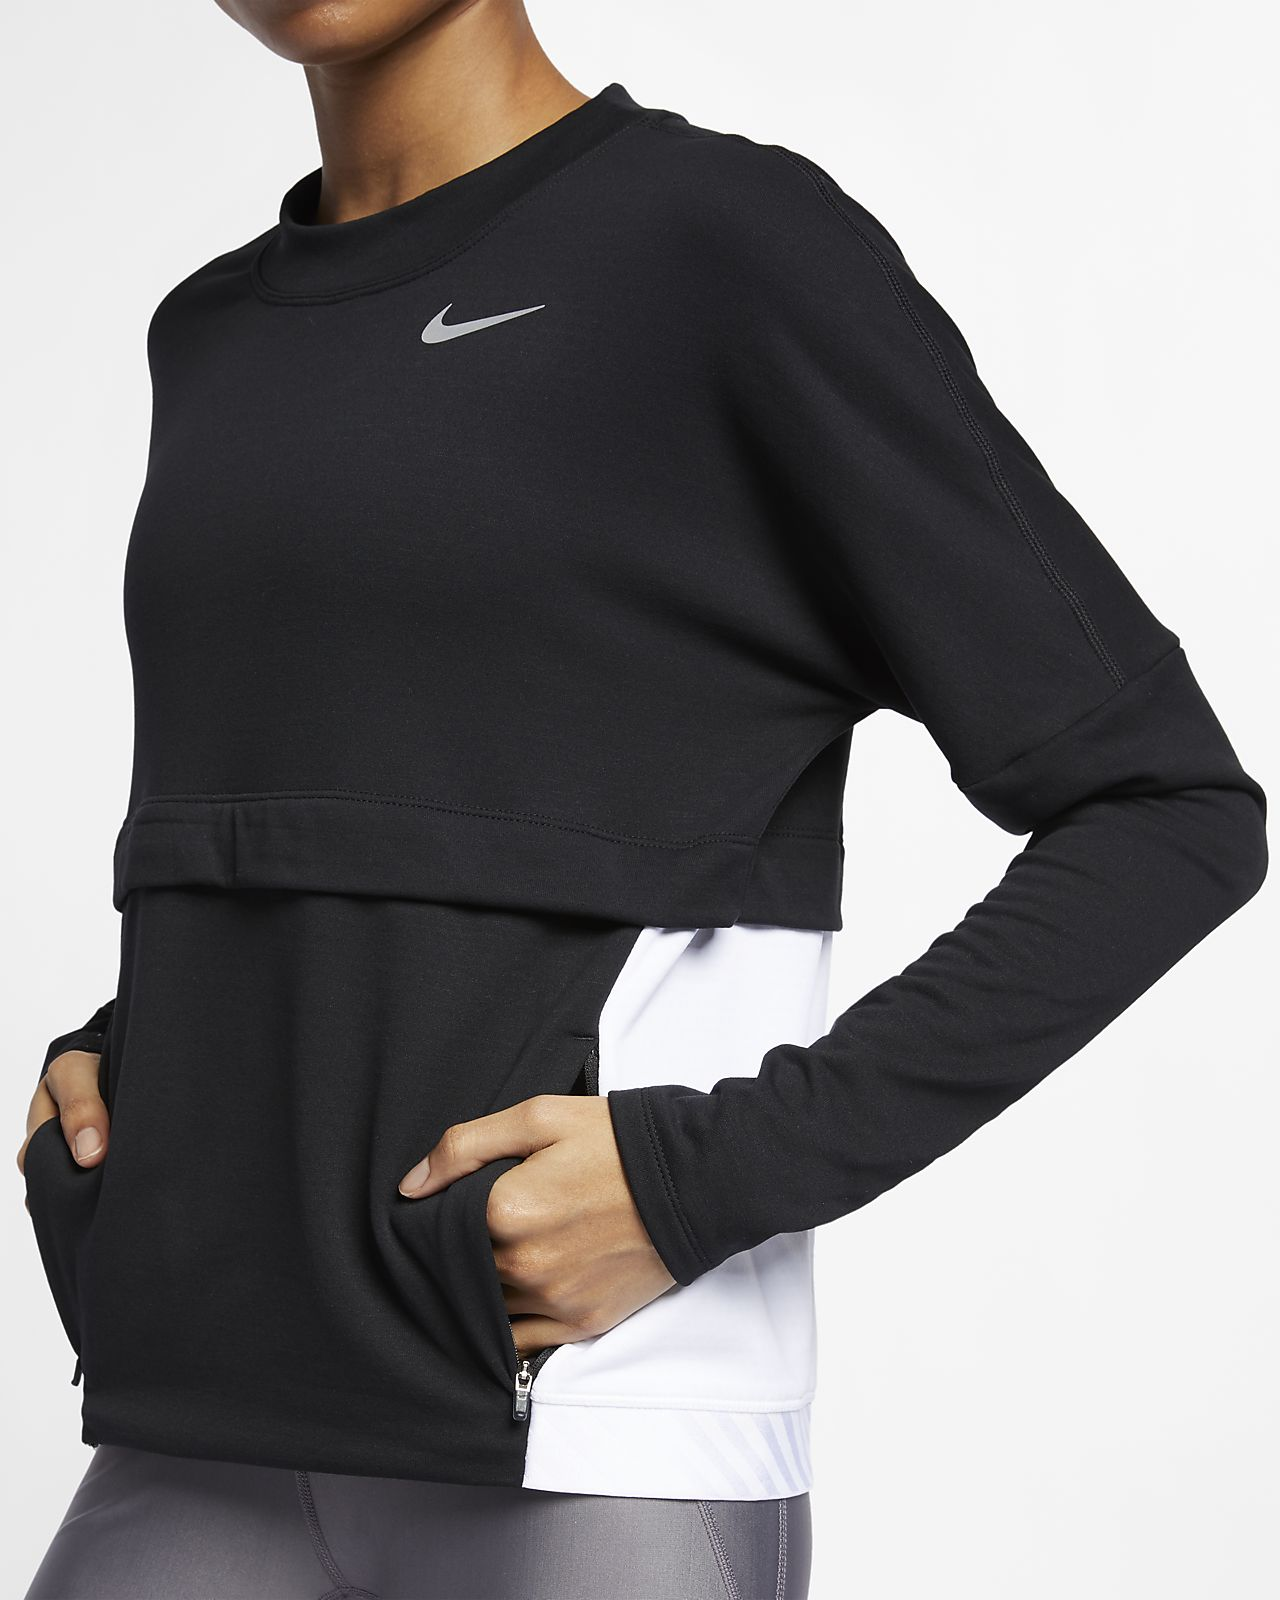 Nike Therma Sphere női futófelső